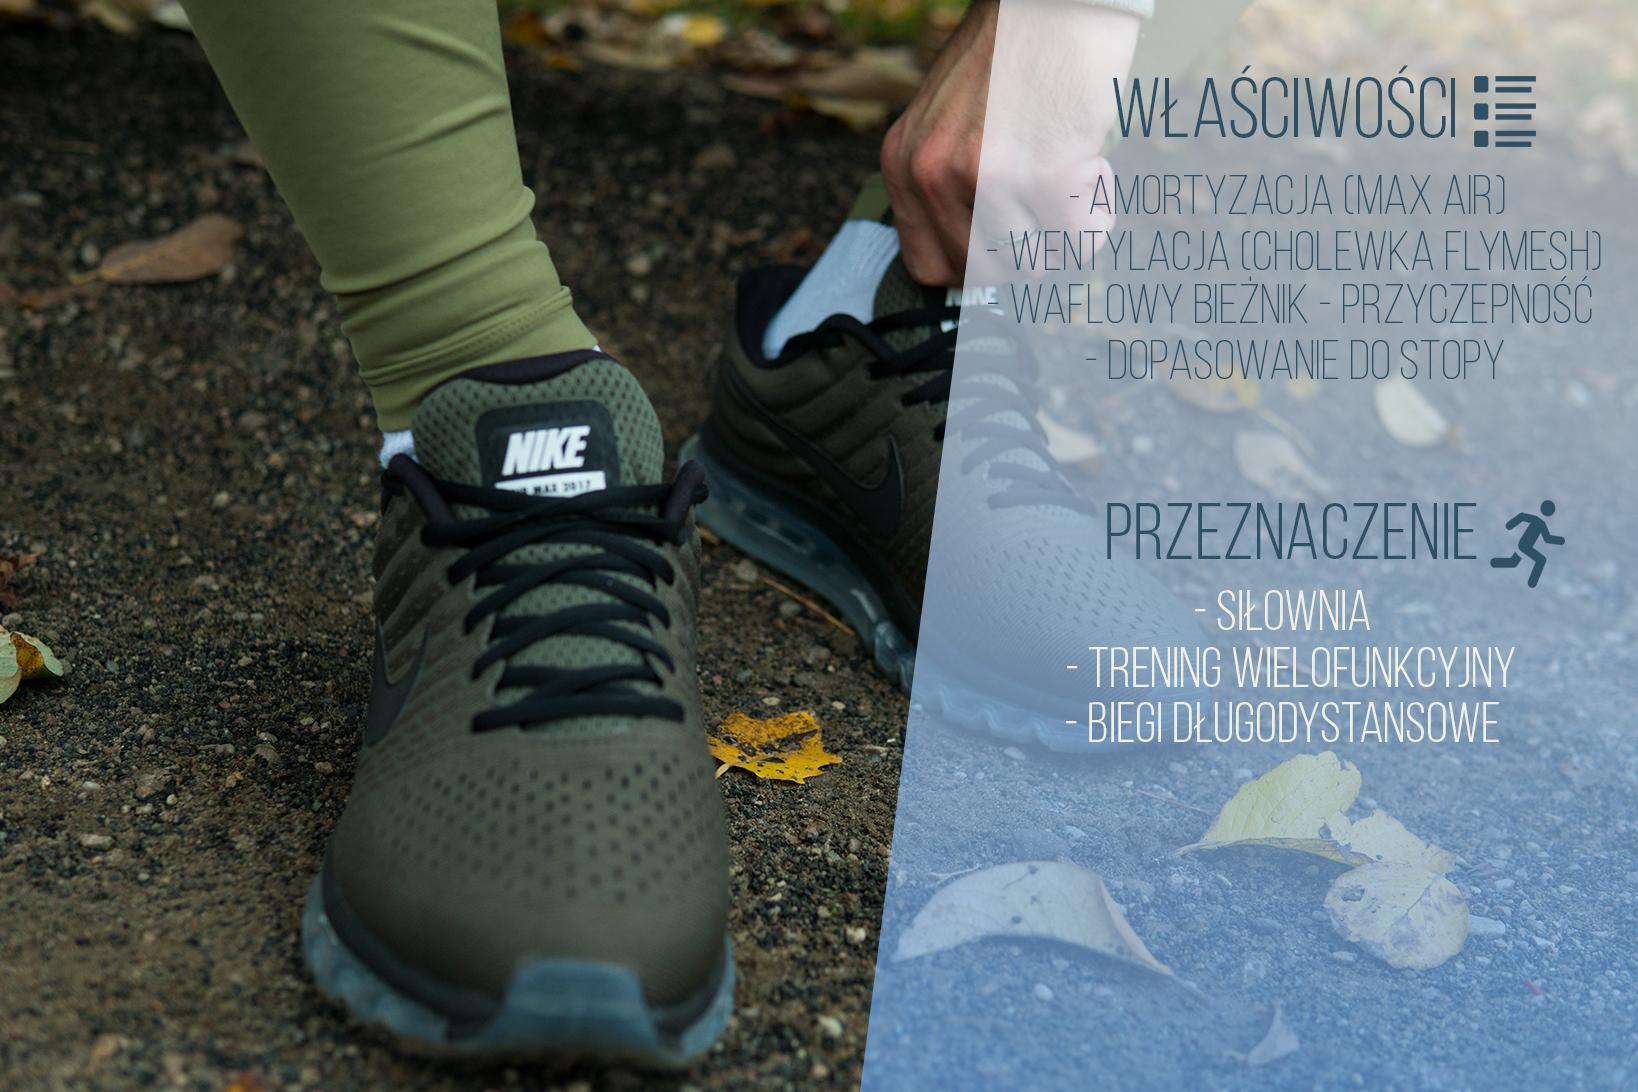 Męska Strefa Treningu: Nike Air Max 2017 [TEST] • Żyjesz.pl